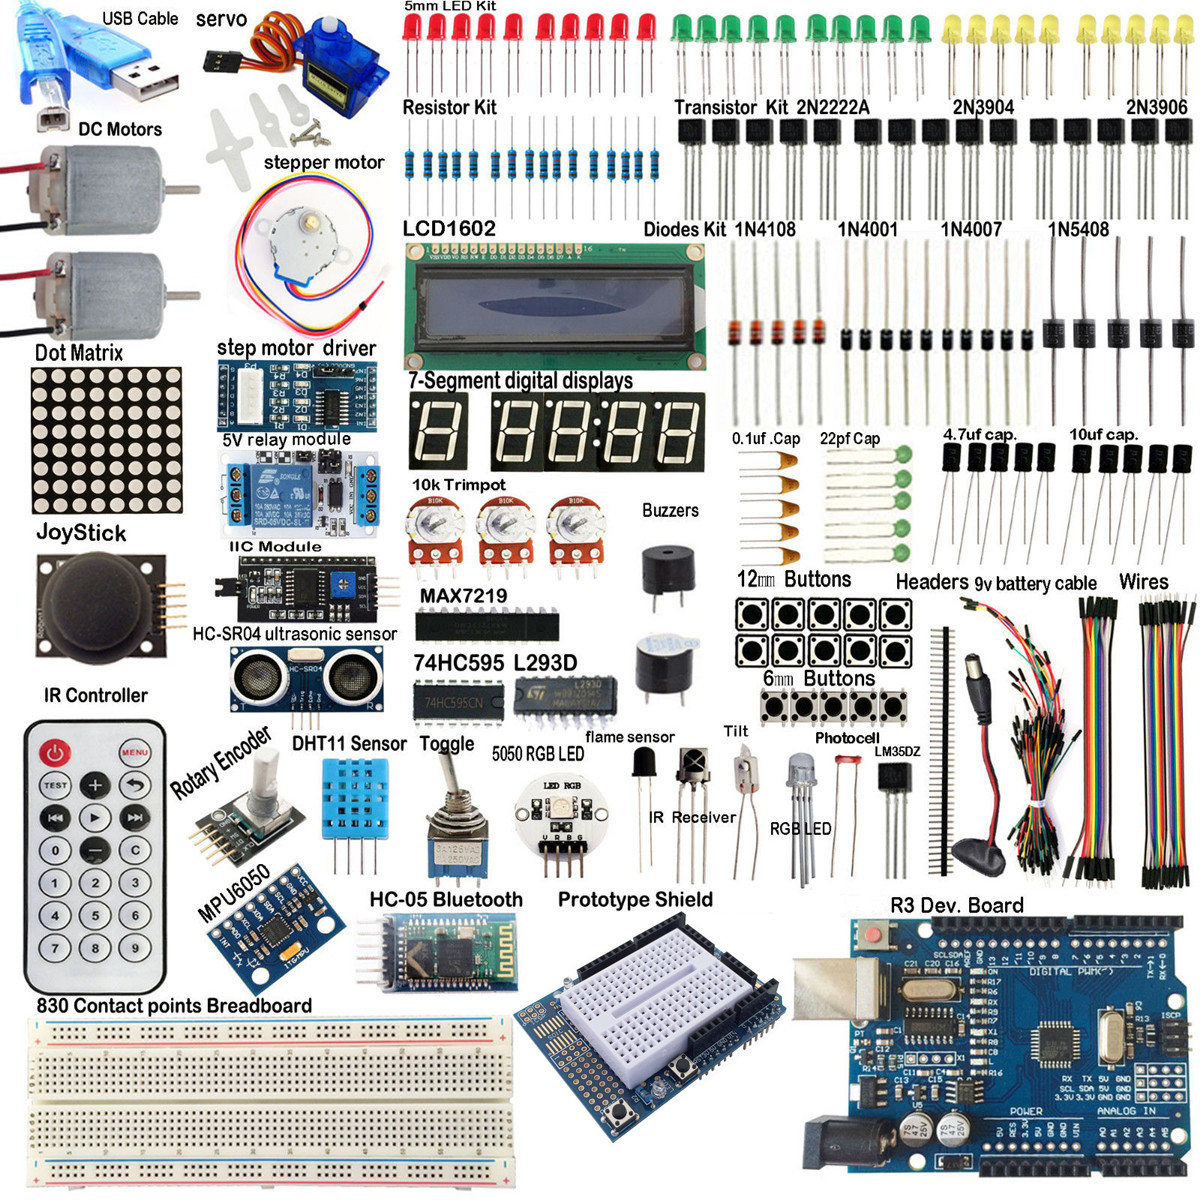 UNO R3 Starter Kits 1602 LCD Módulo de Relé MPU6050 HC-05 Placa bluetooth Para Arduino